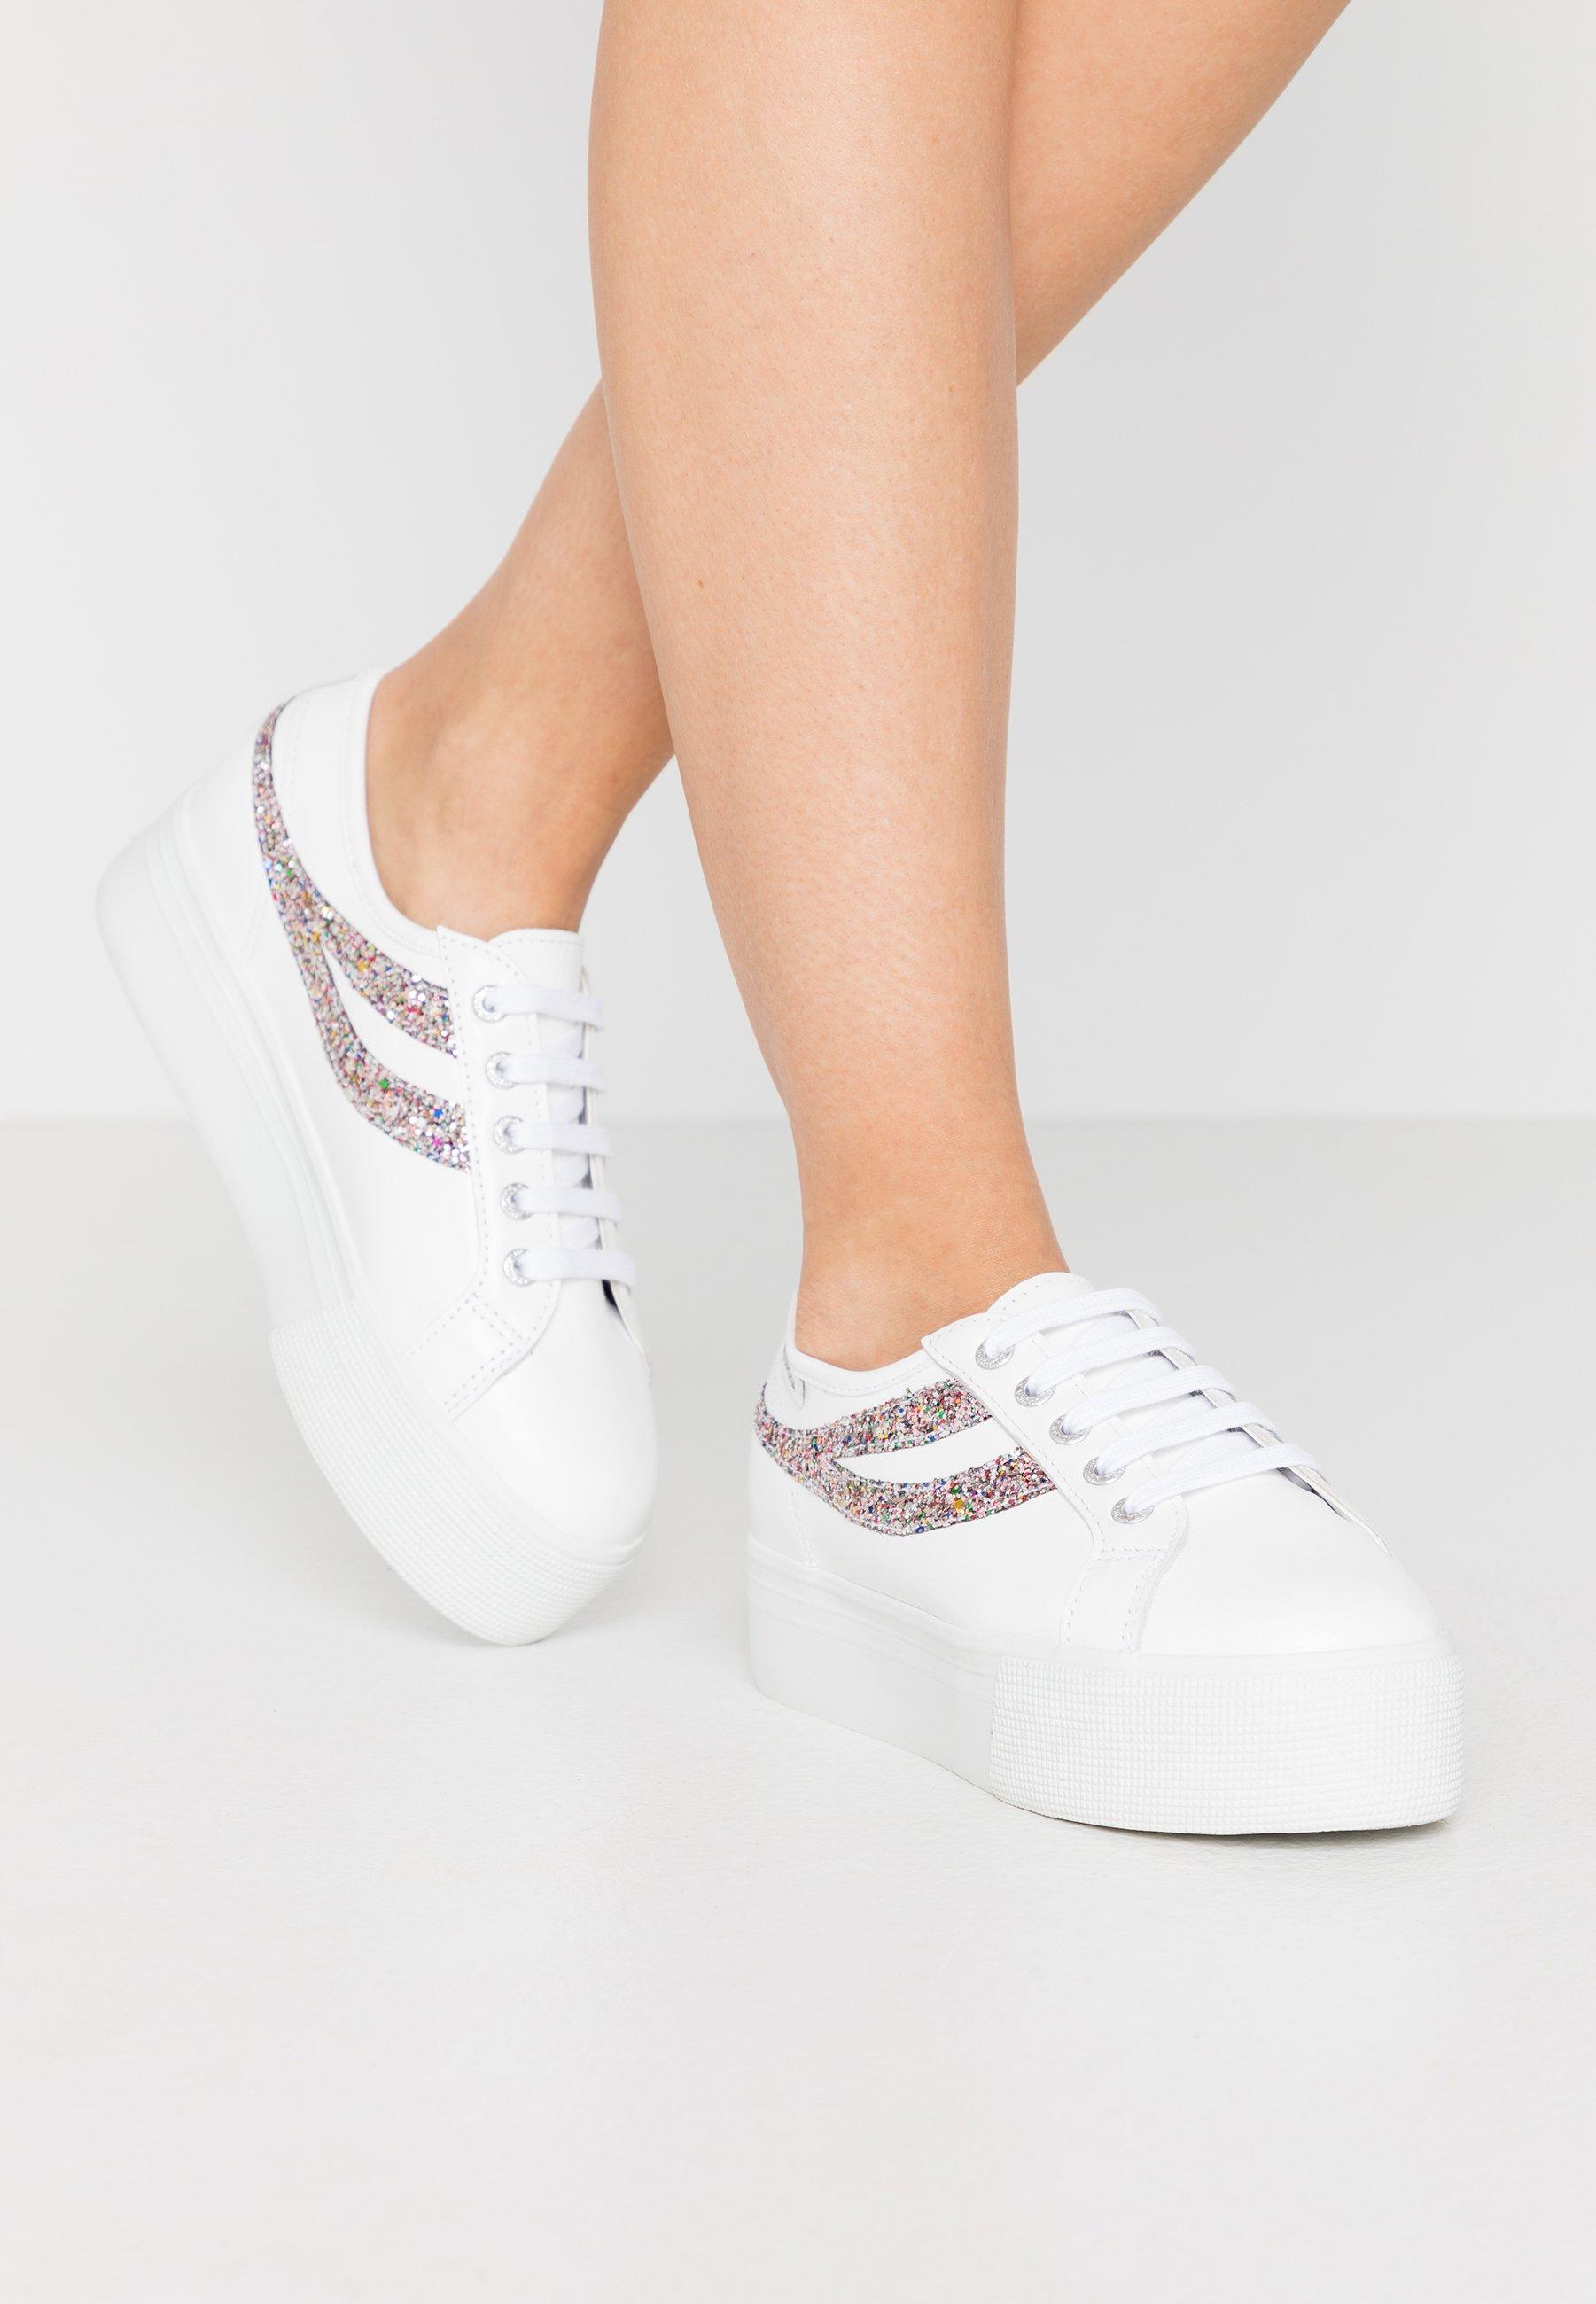 Gutes Angebot Superga 2790 - Sneaker low - white/silver/multicolor | Damenbekleidung 2020